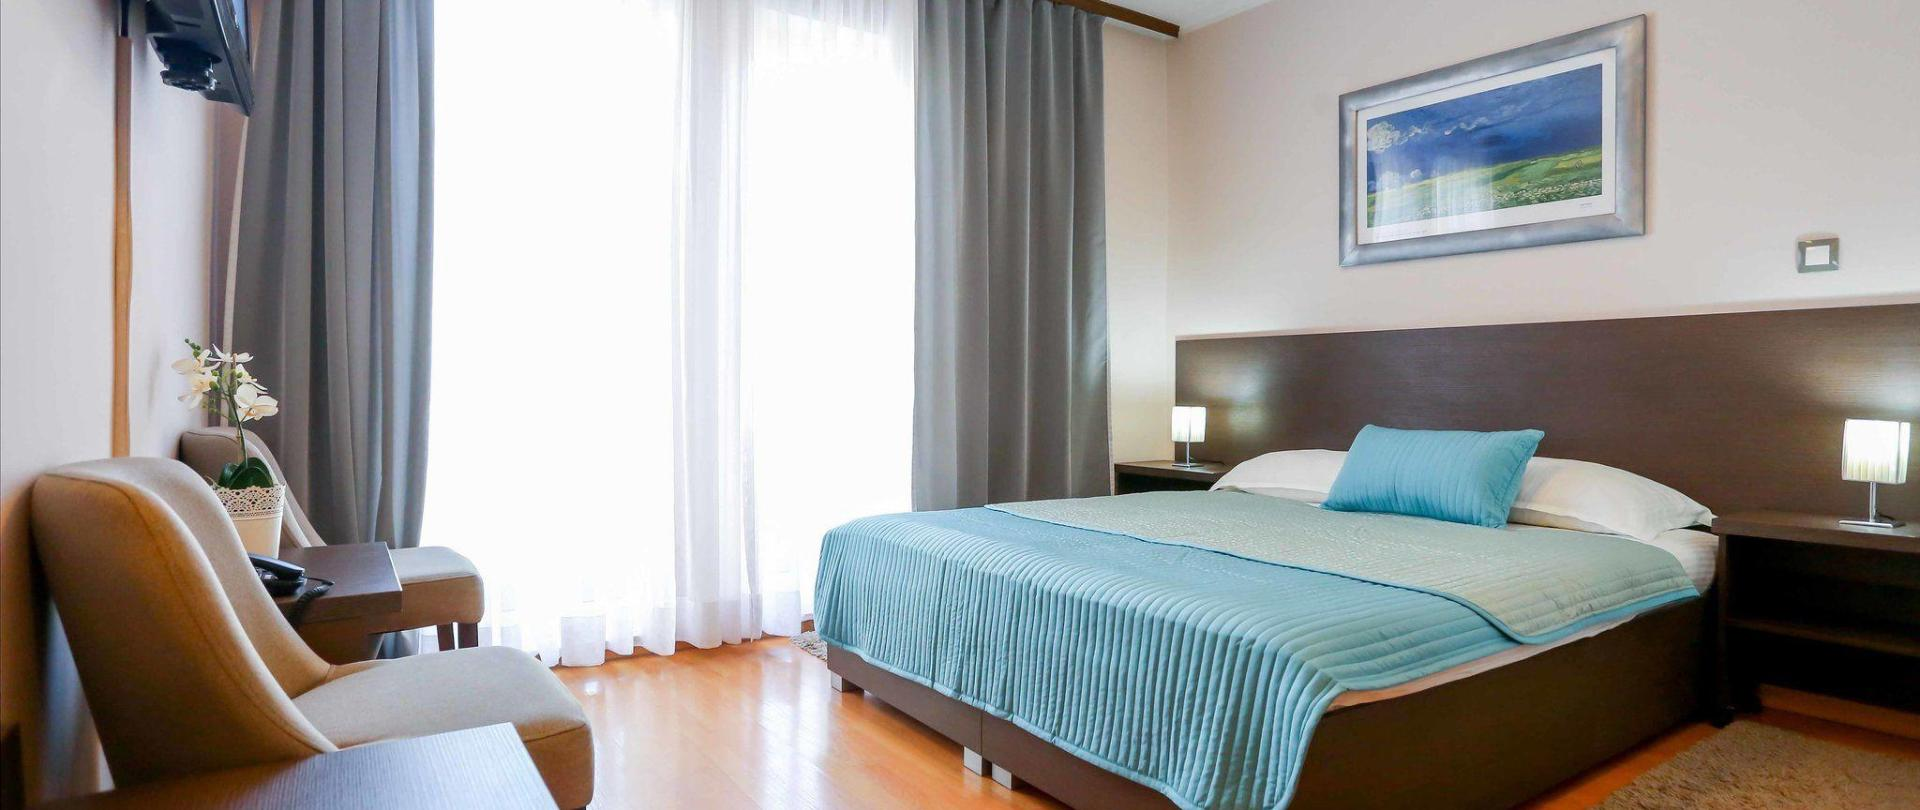 hotel-divan-by-dzenat-drekovic-29-08-2016-11.jpg